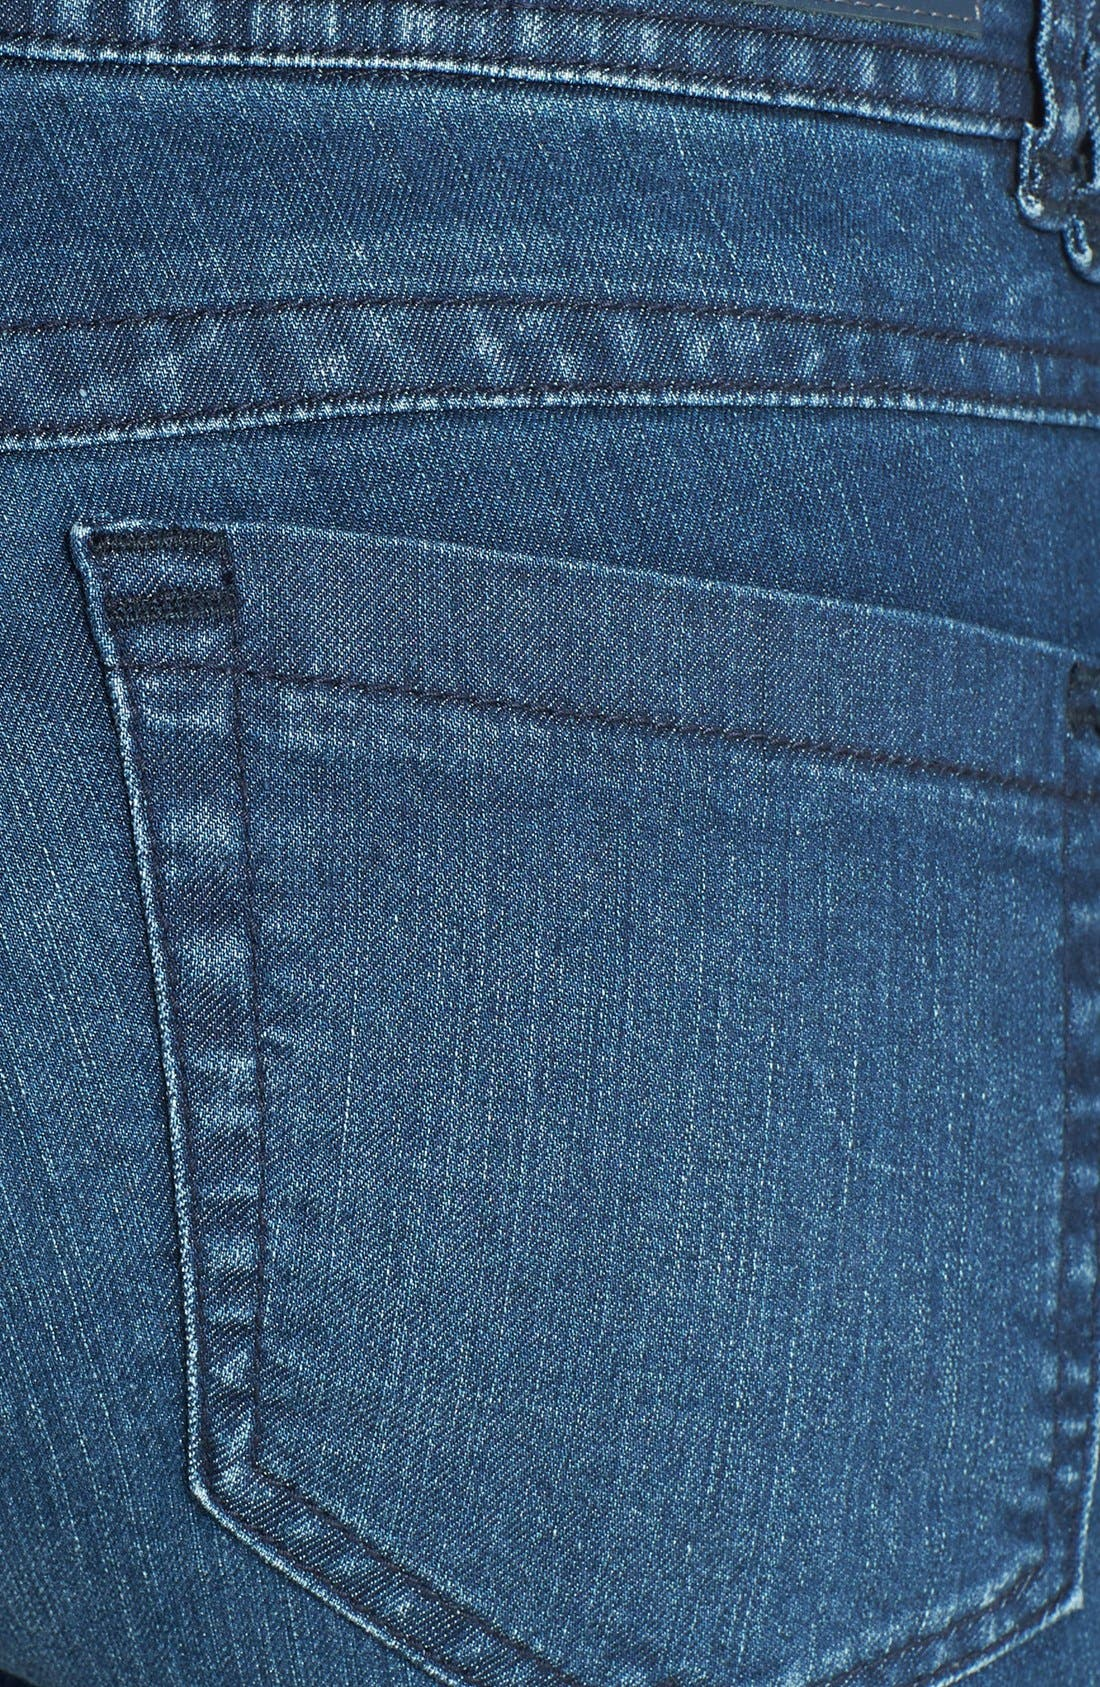 Alternate Image 3  - Wit & Wisdom Stretch Ankle Skinny Jeans (Tencel Indigo) (Nordstrom Exclusive)